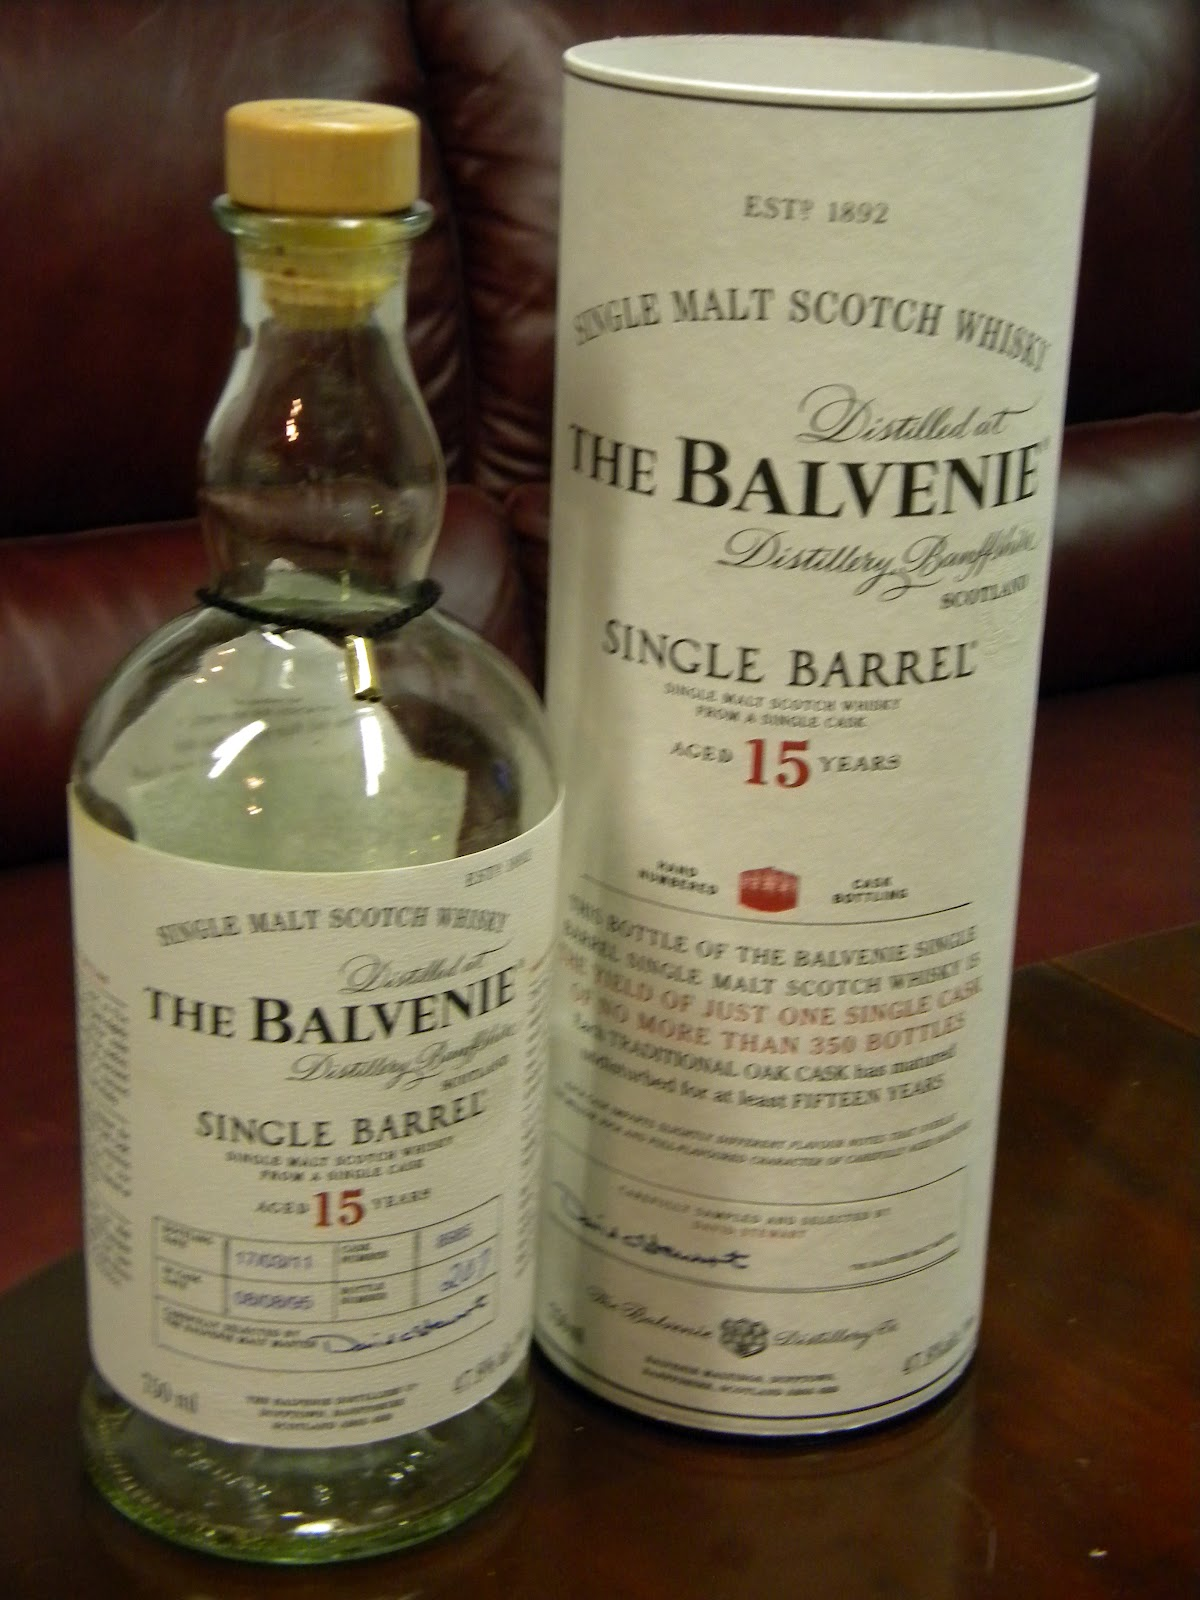 Balvenie DoubleWood 12 Year Old Whisky - Master of Malt